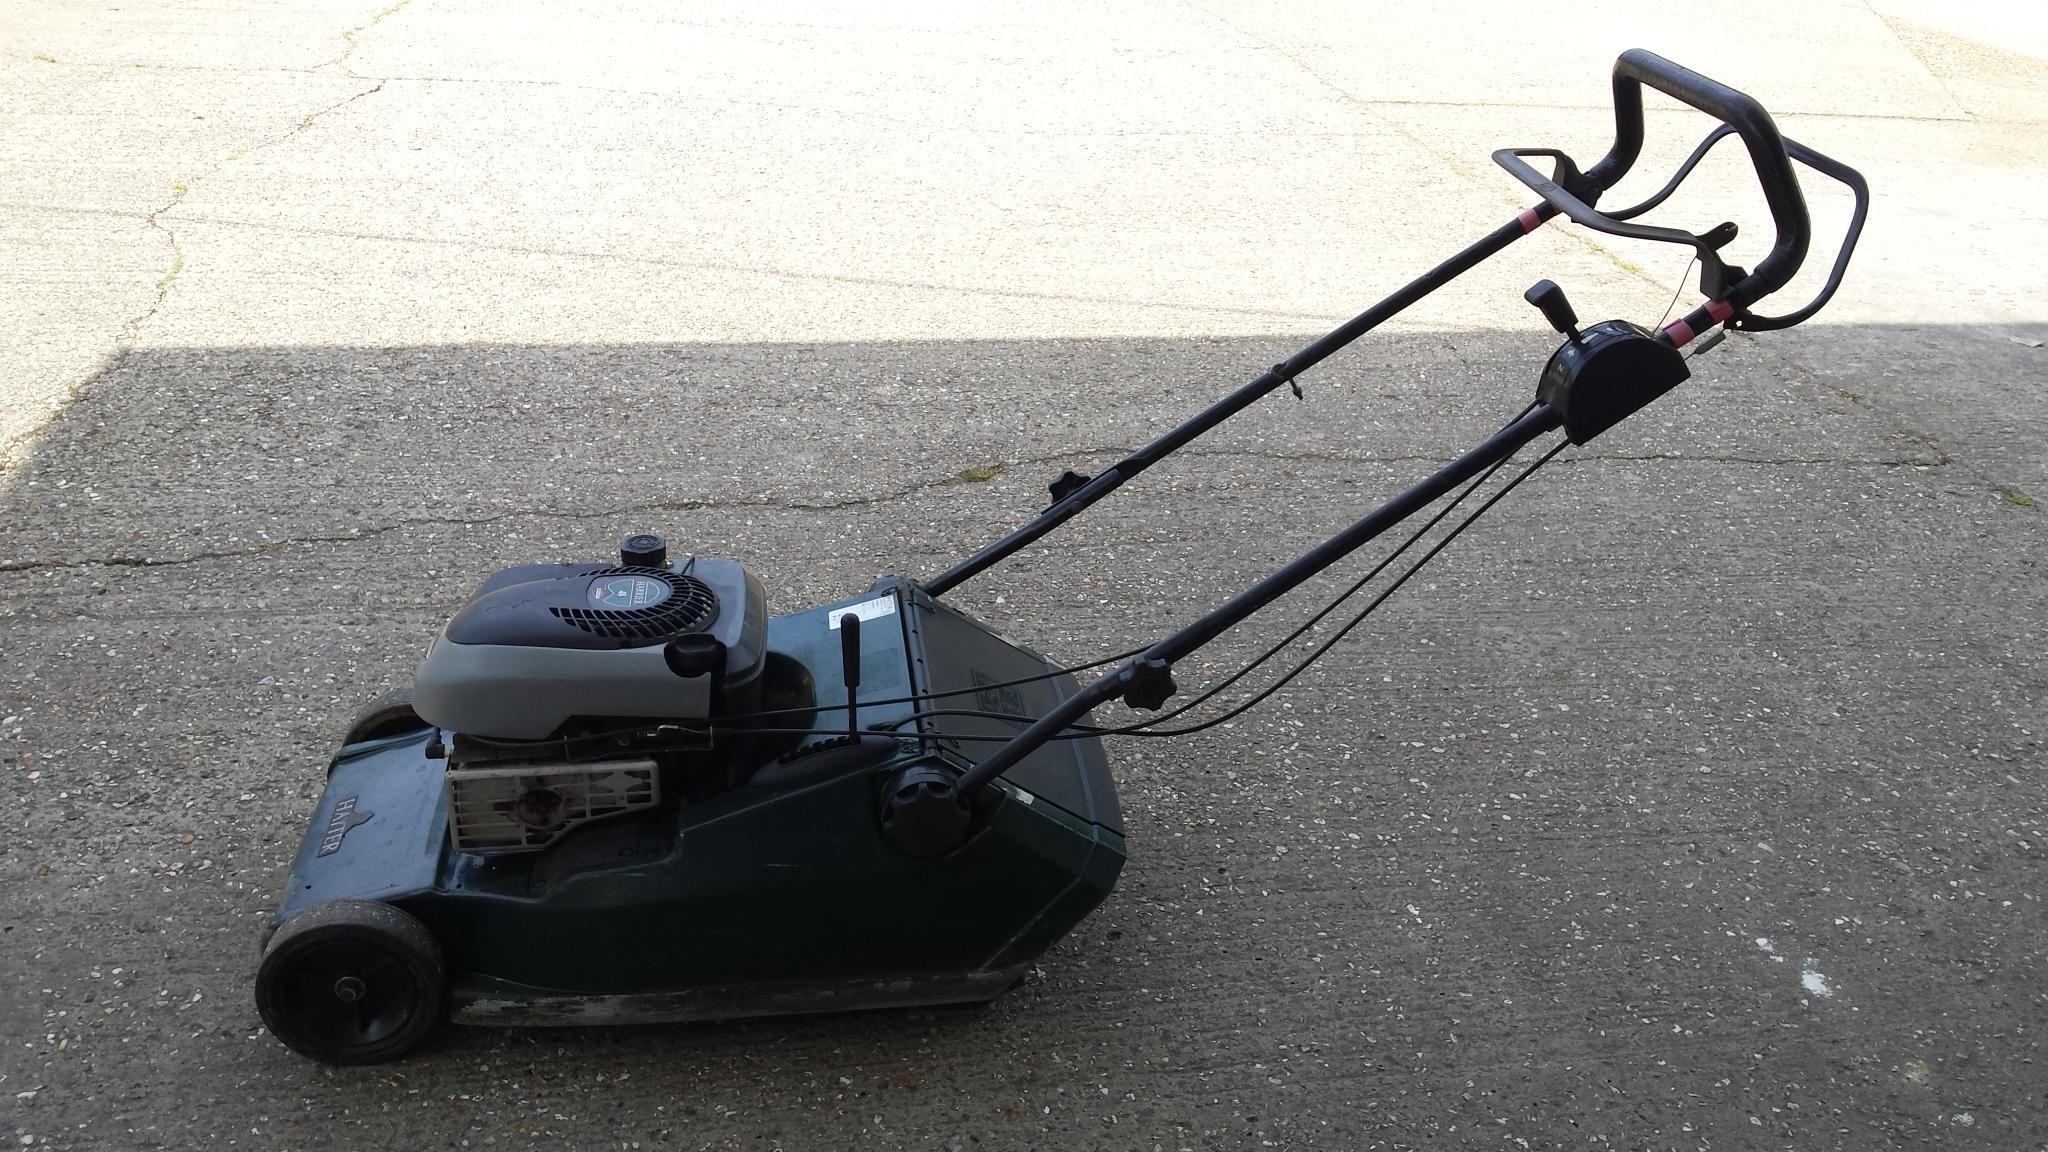 Hayter 48 self propelled mower cost £700